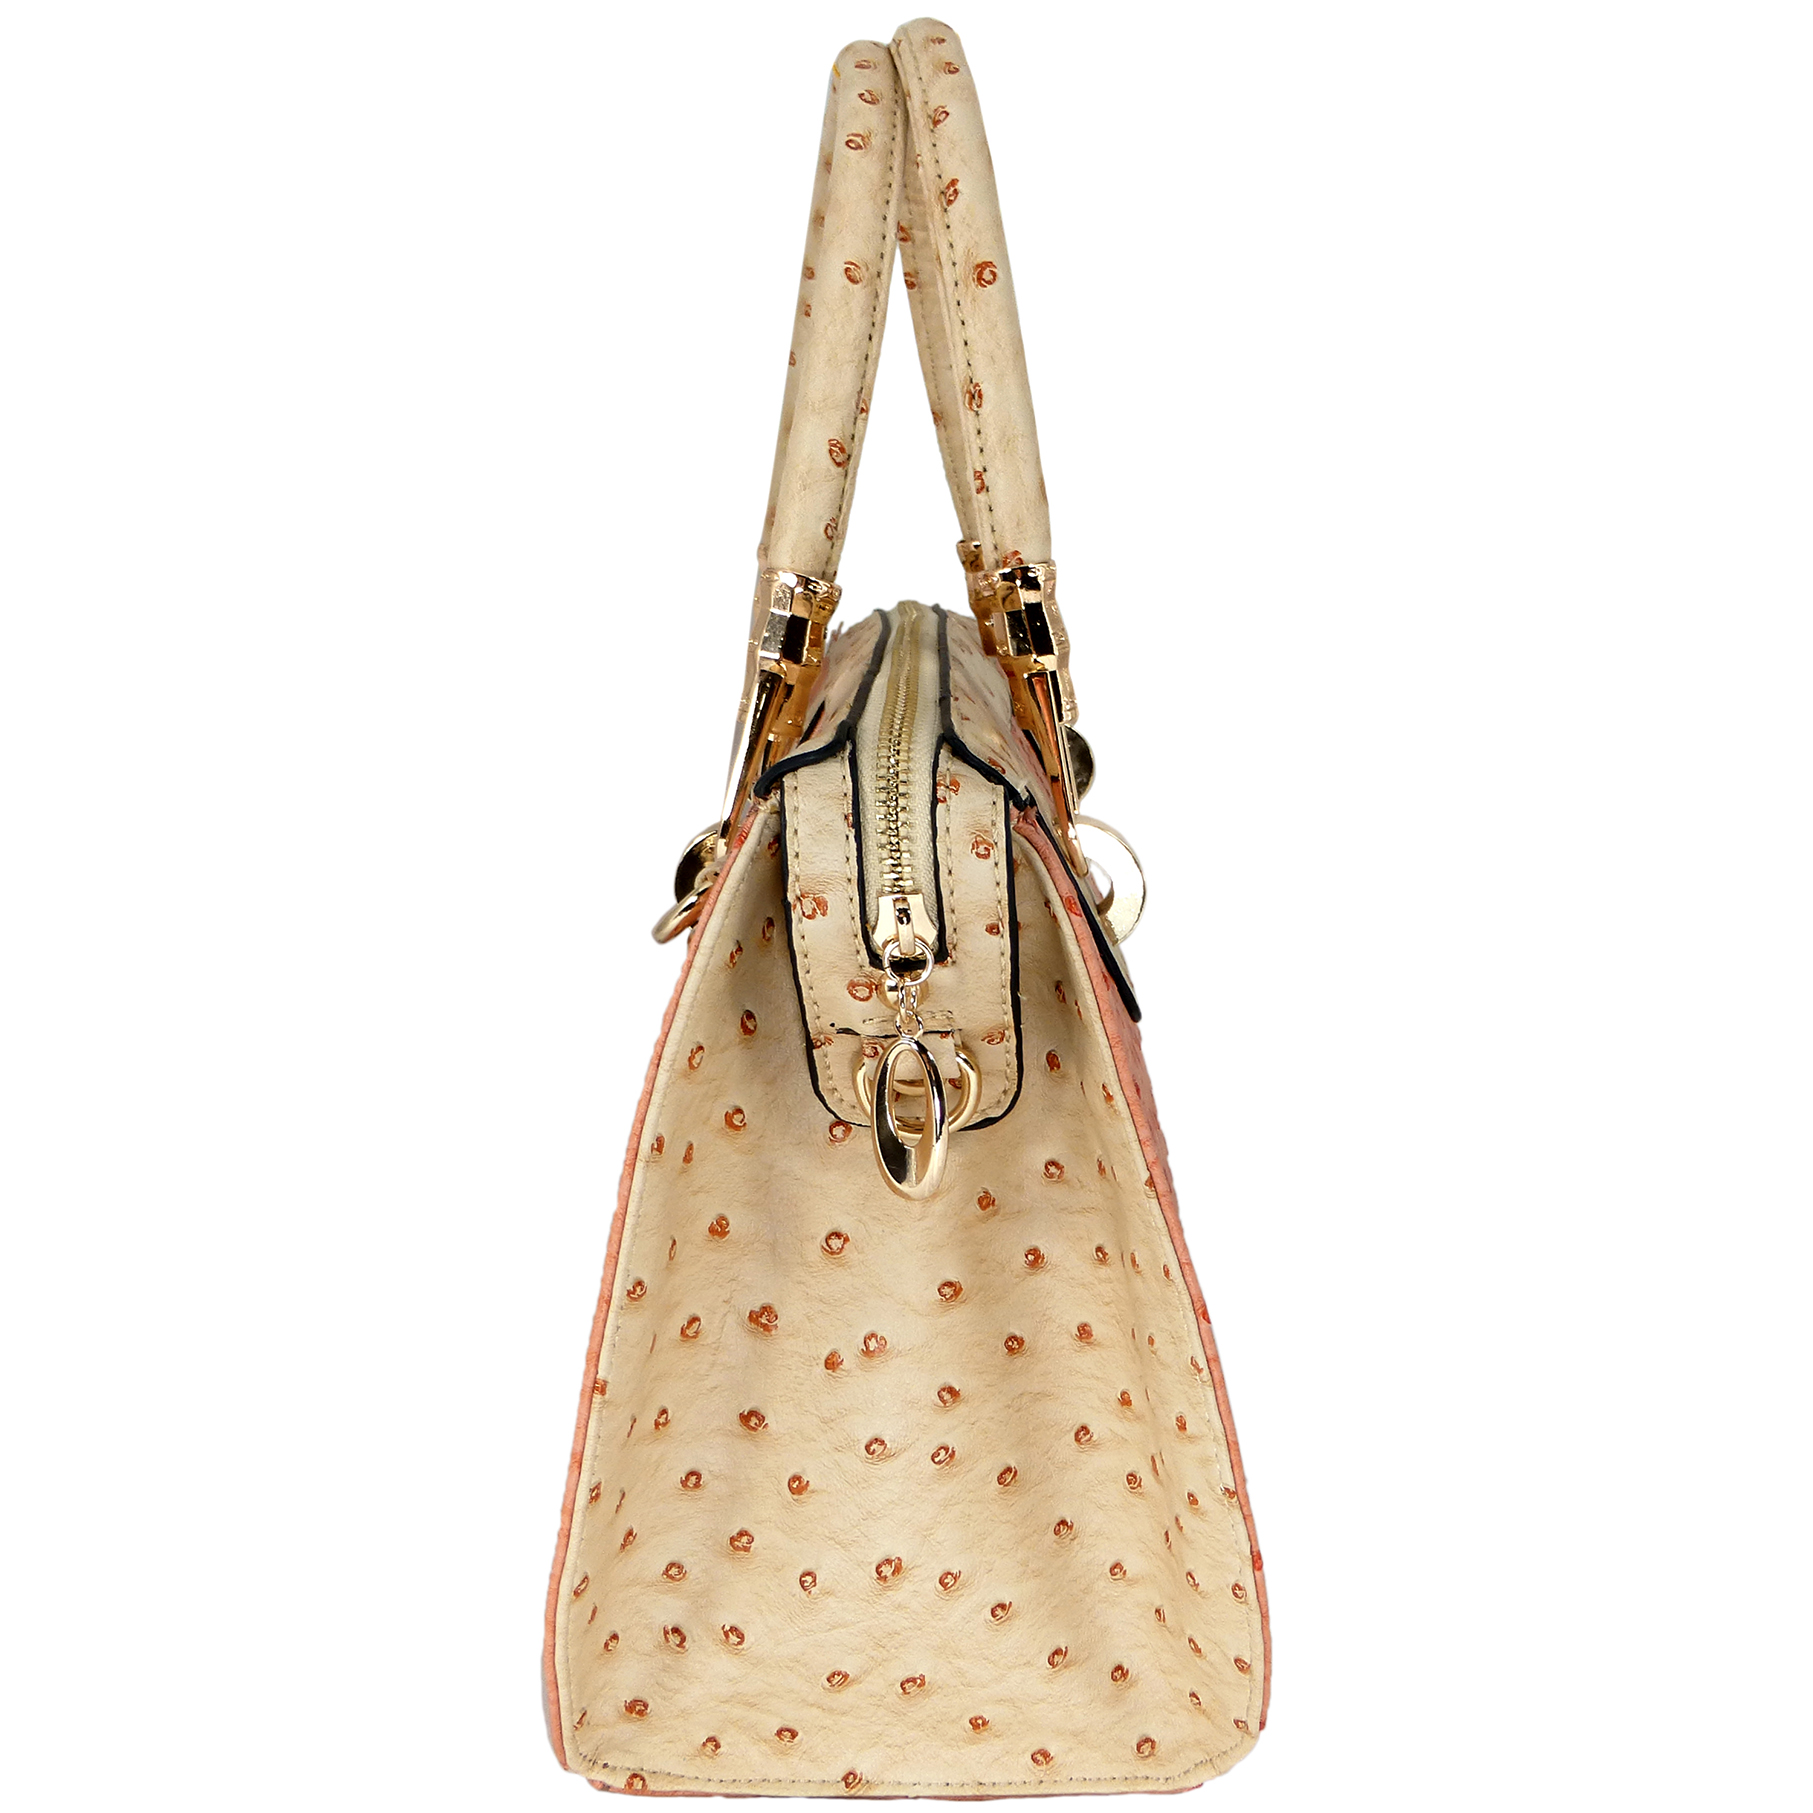 MARISSA Pink Doctor Style Handbag side